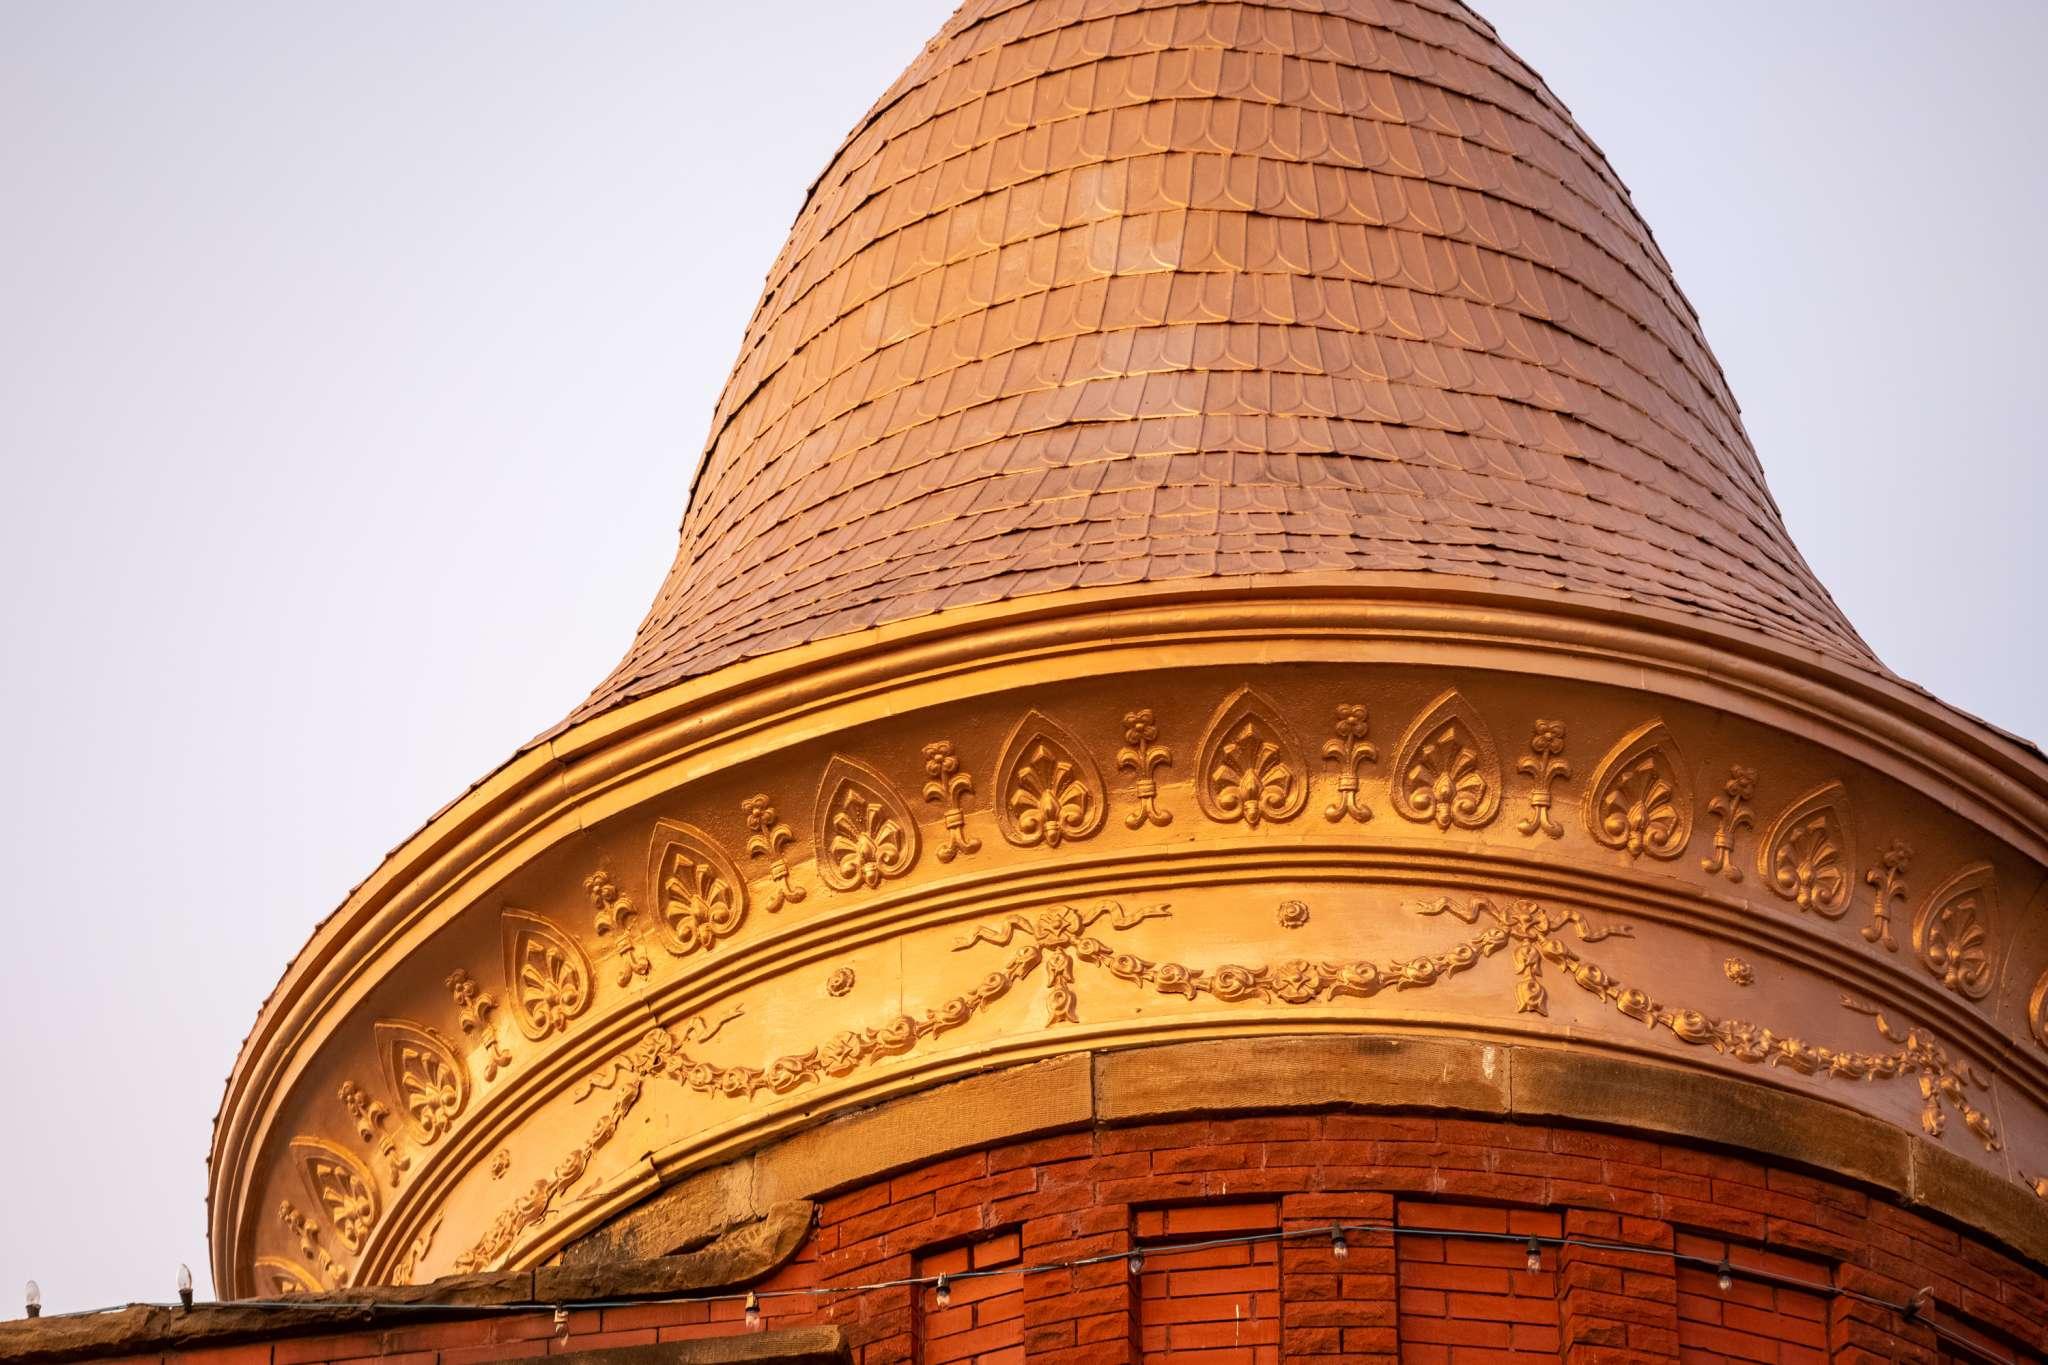 Eufaula, OK Foley Building Dome Historic Downtown